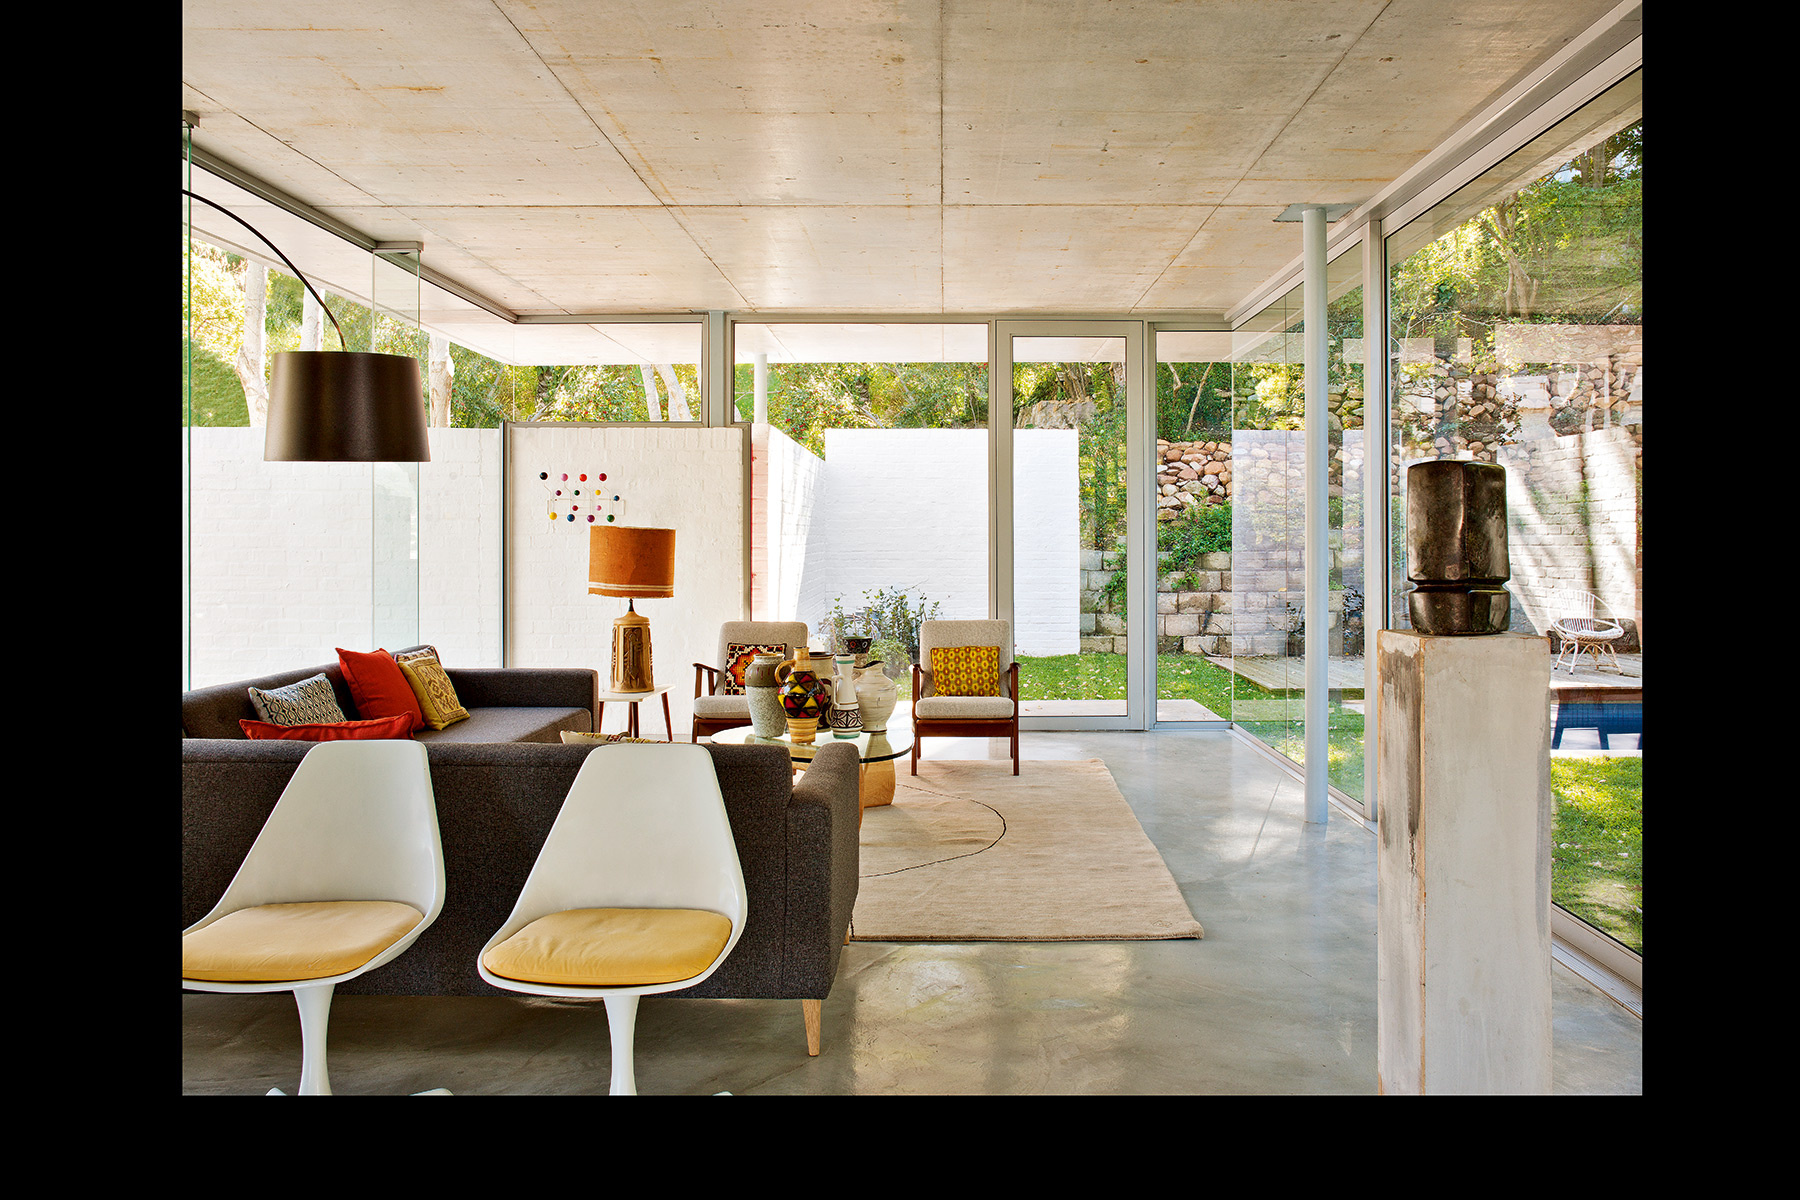 casa_sudafrica_verde_5553_1800x1200